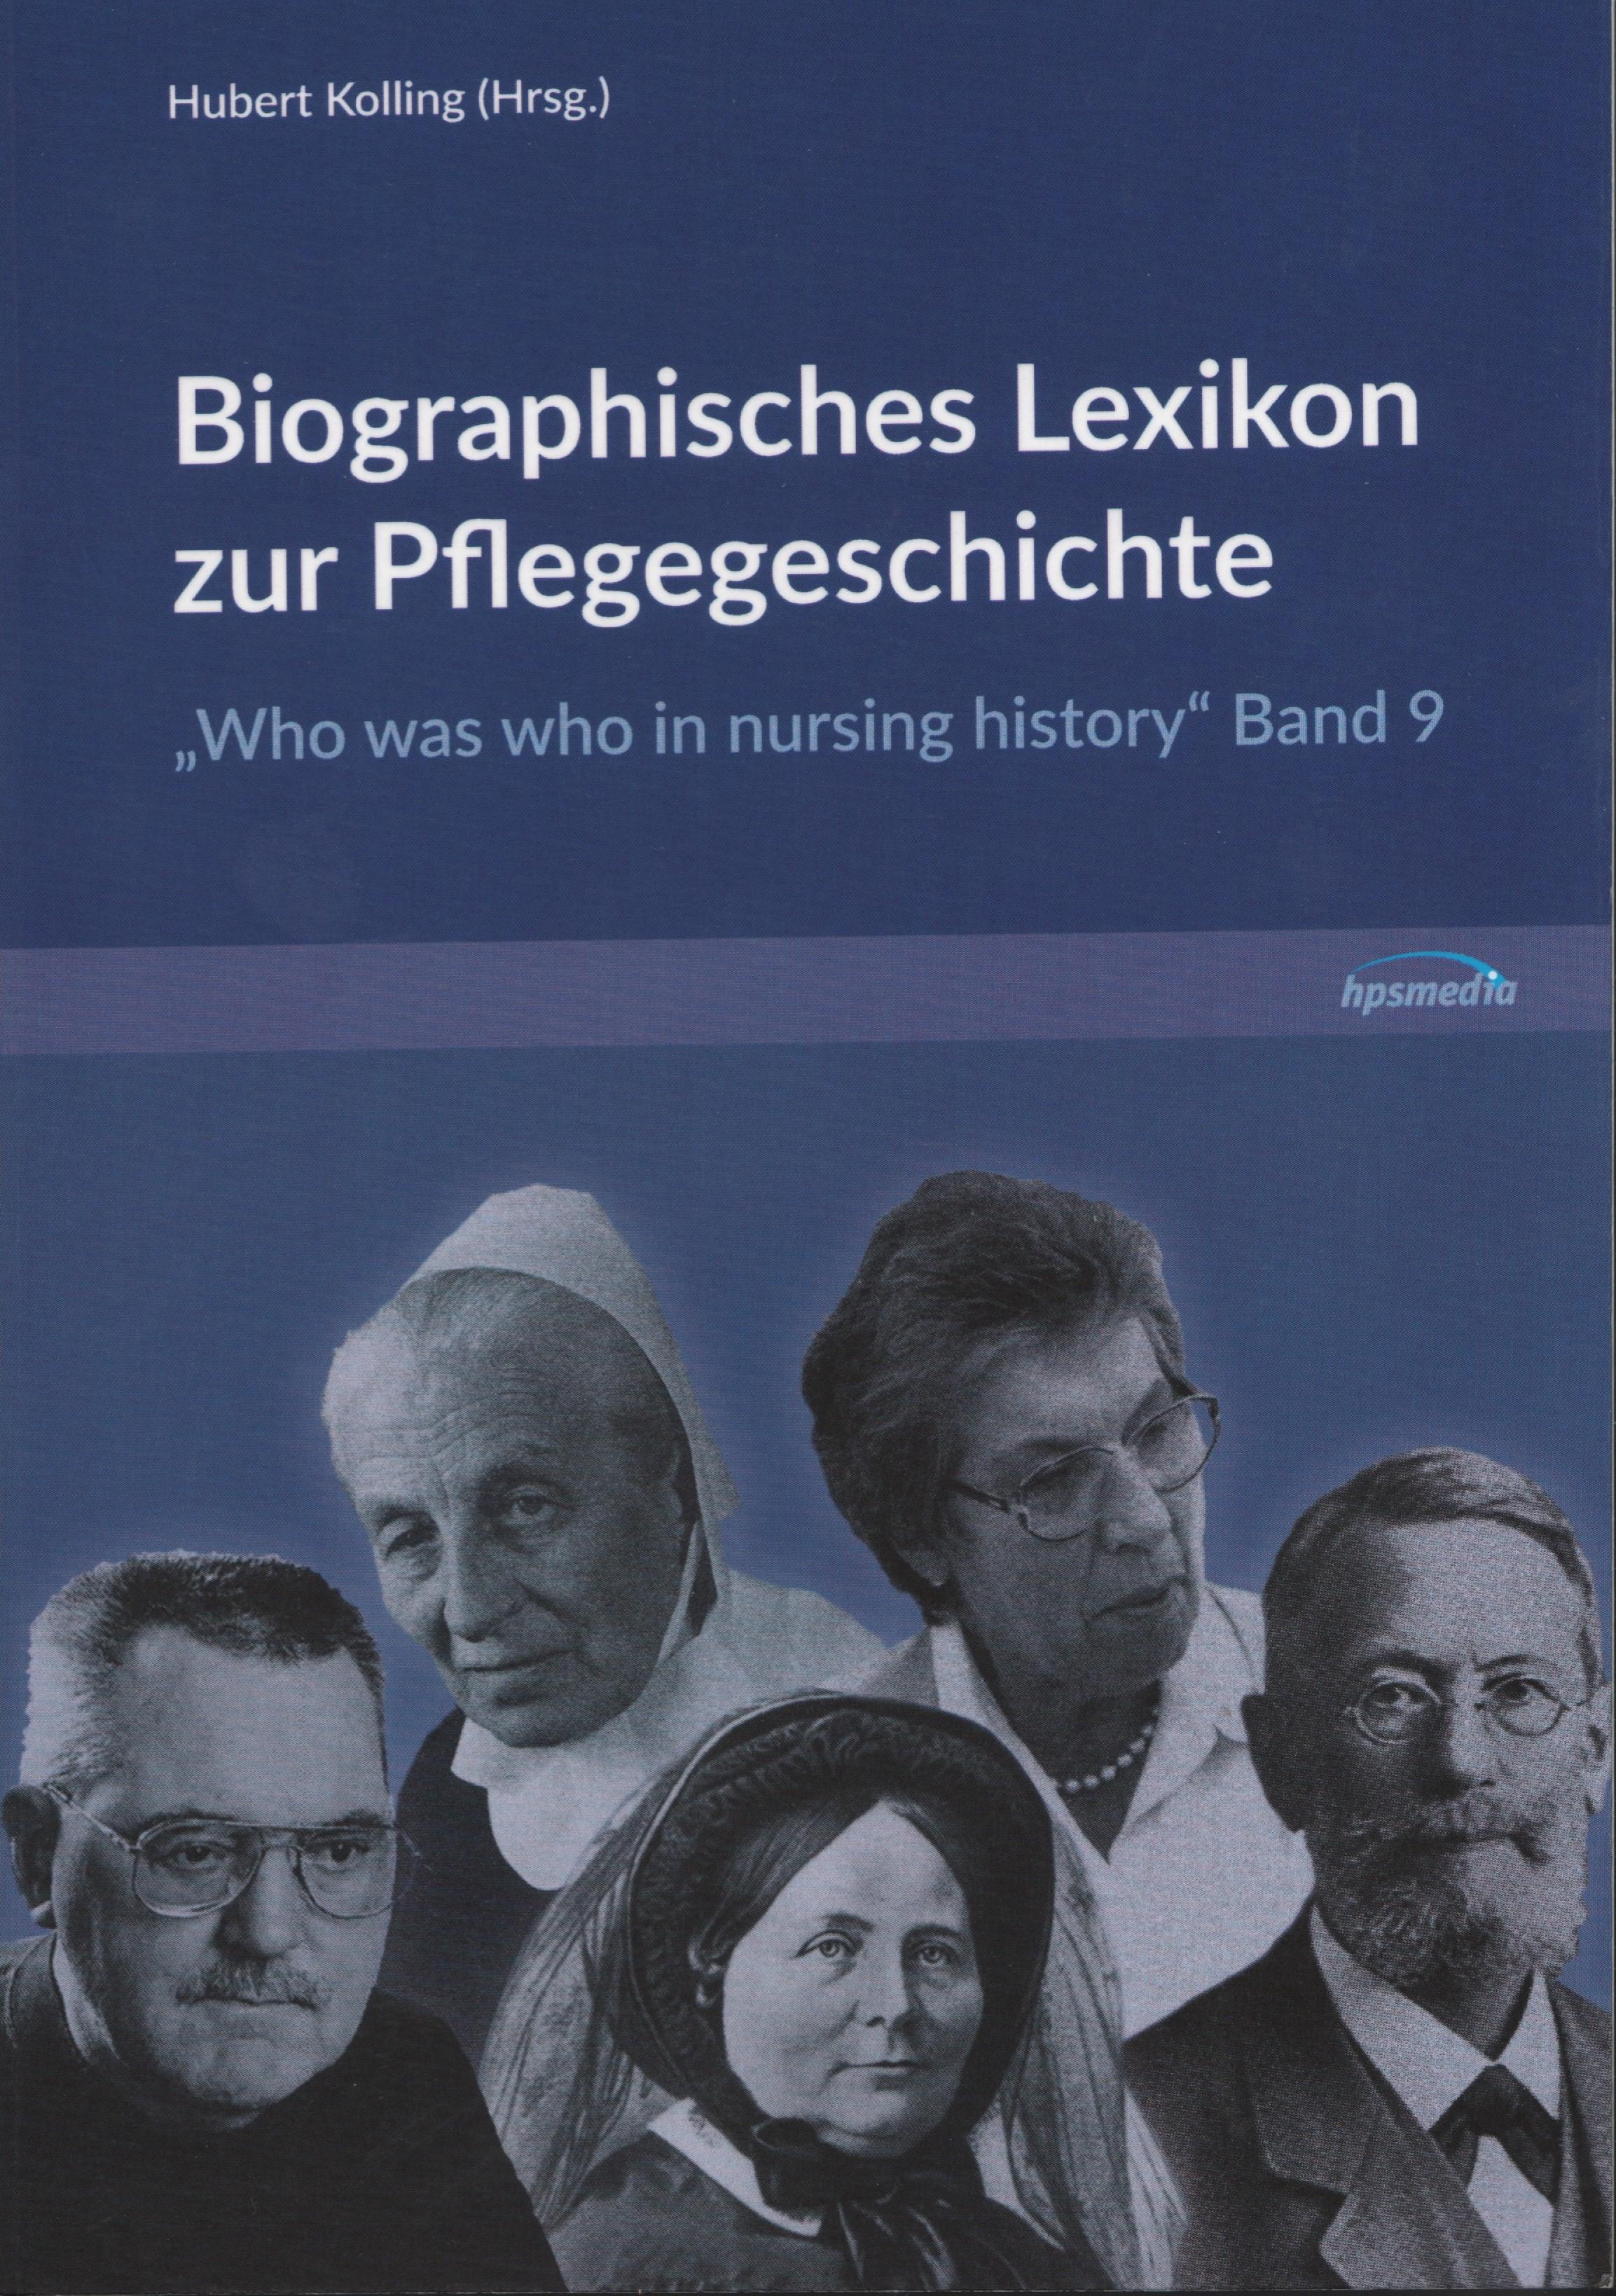 Cover zu KOLLING Biographisches Lexikon, Band 9